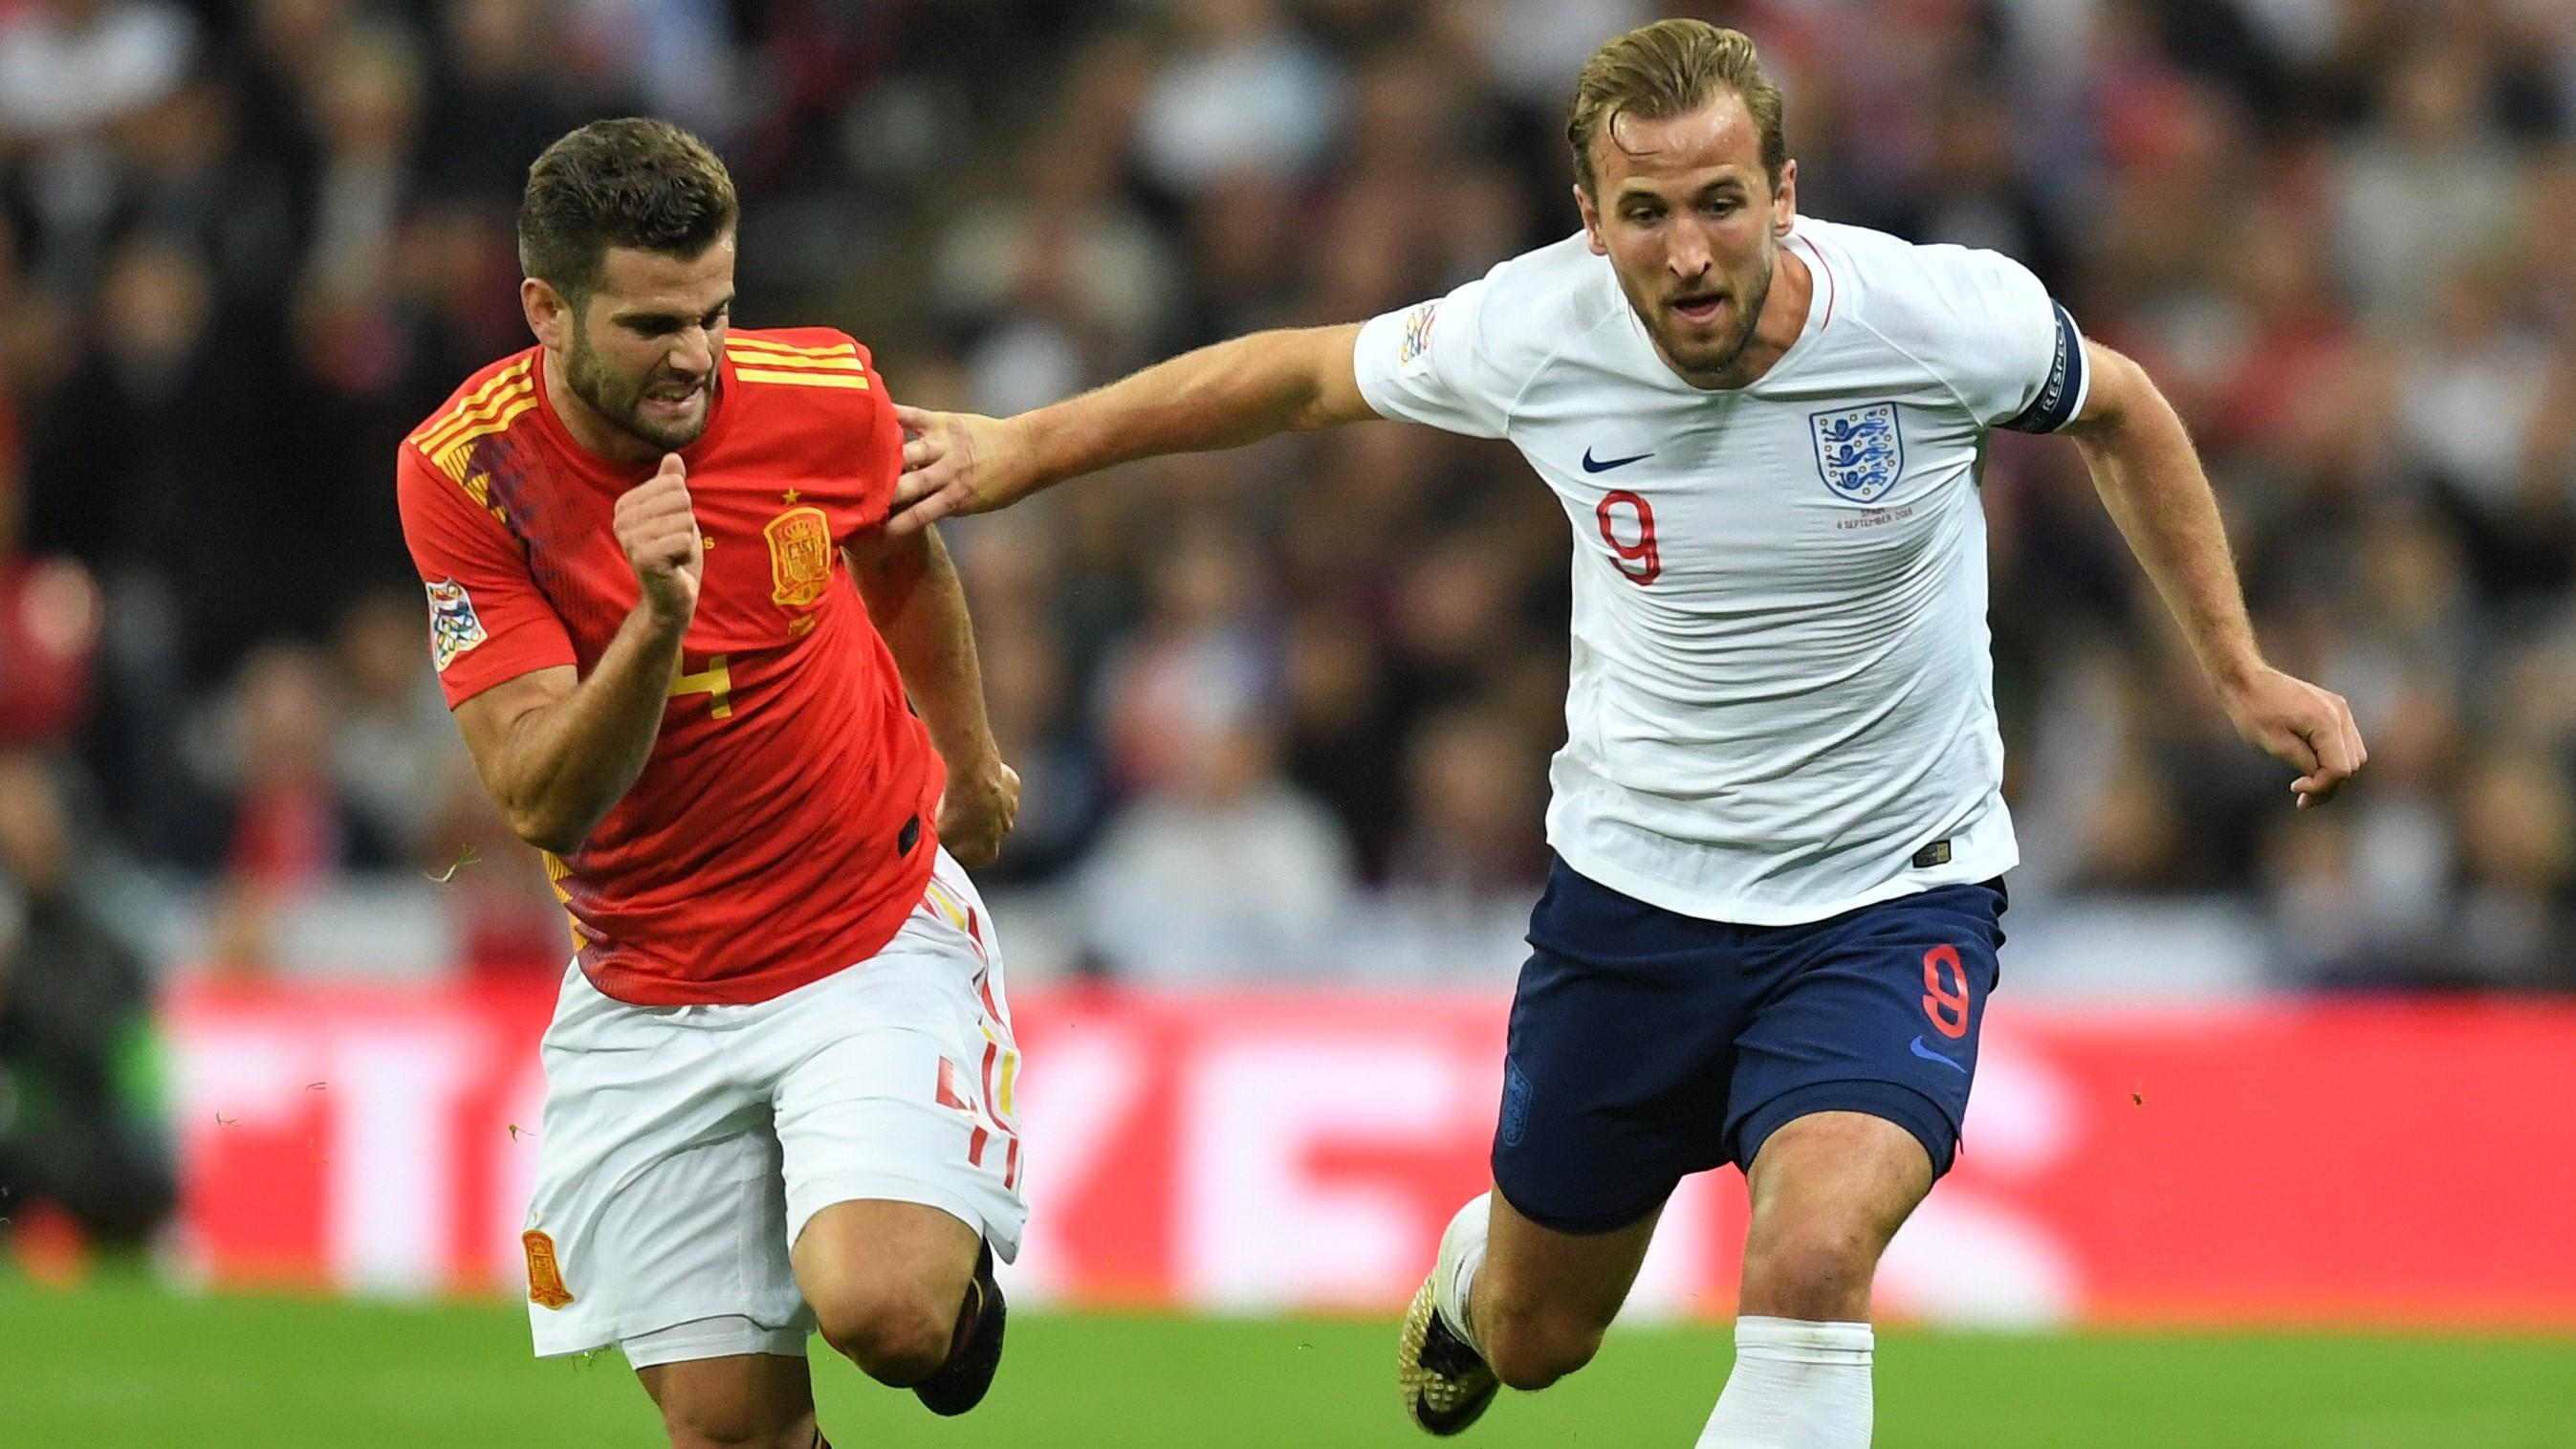 Nacho Fernandez Harry Kane Inglaterra España England Spain Nations League 08092018